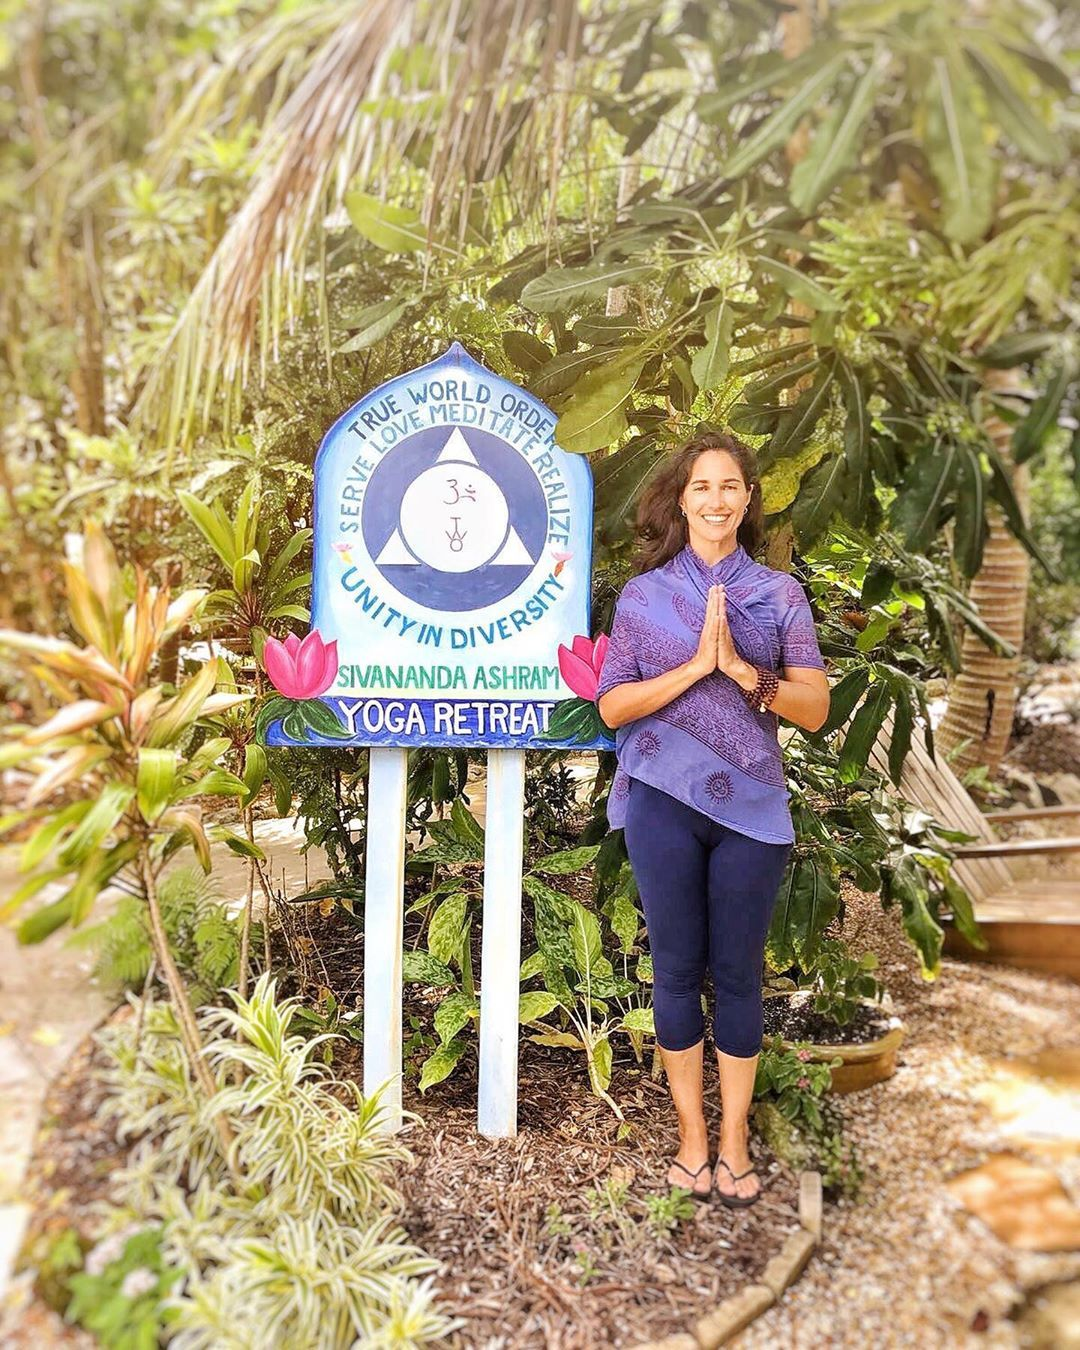 Bahamas My Heart Is With You May You Be Safe From Hurricane Dorian Susavasana Yogis Ashram Nature Yogaphoto Sivananda Yoga Yoga Everyday Yoga Photos